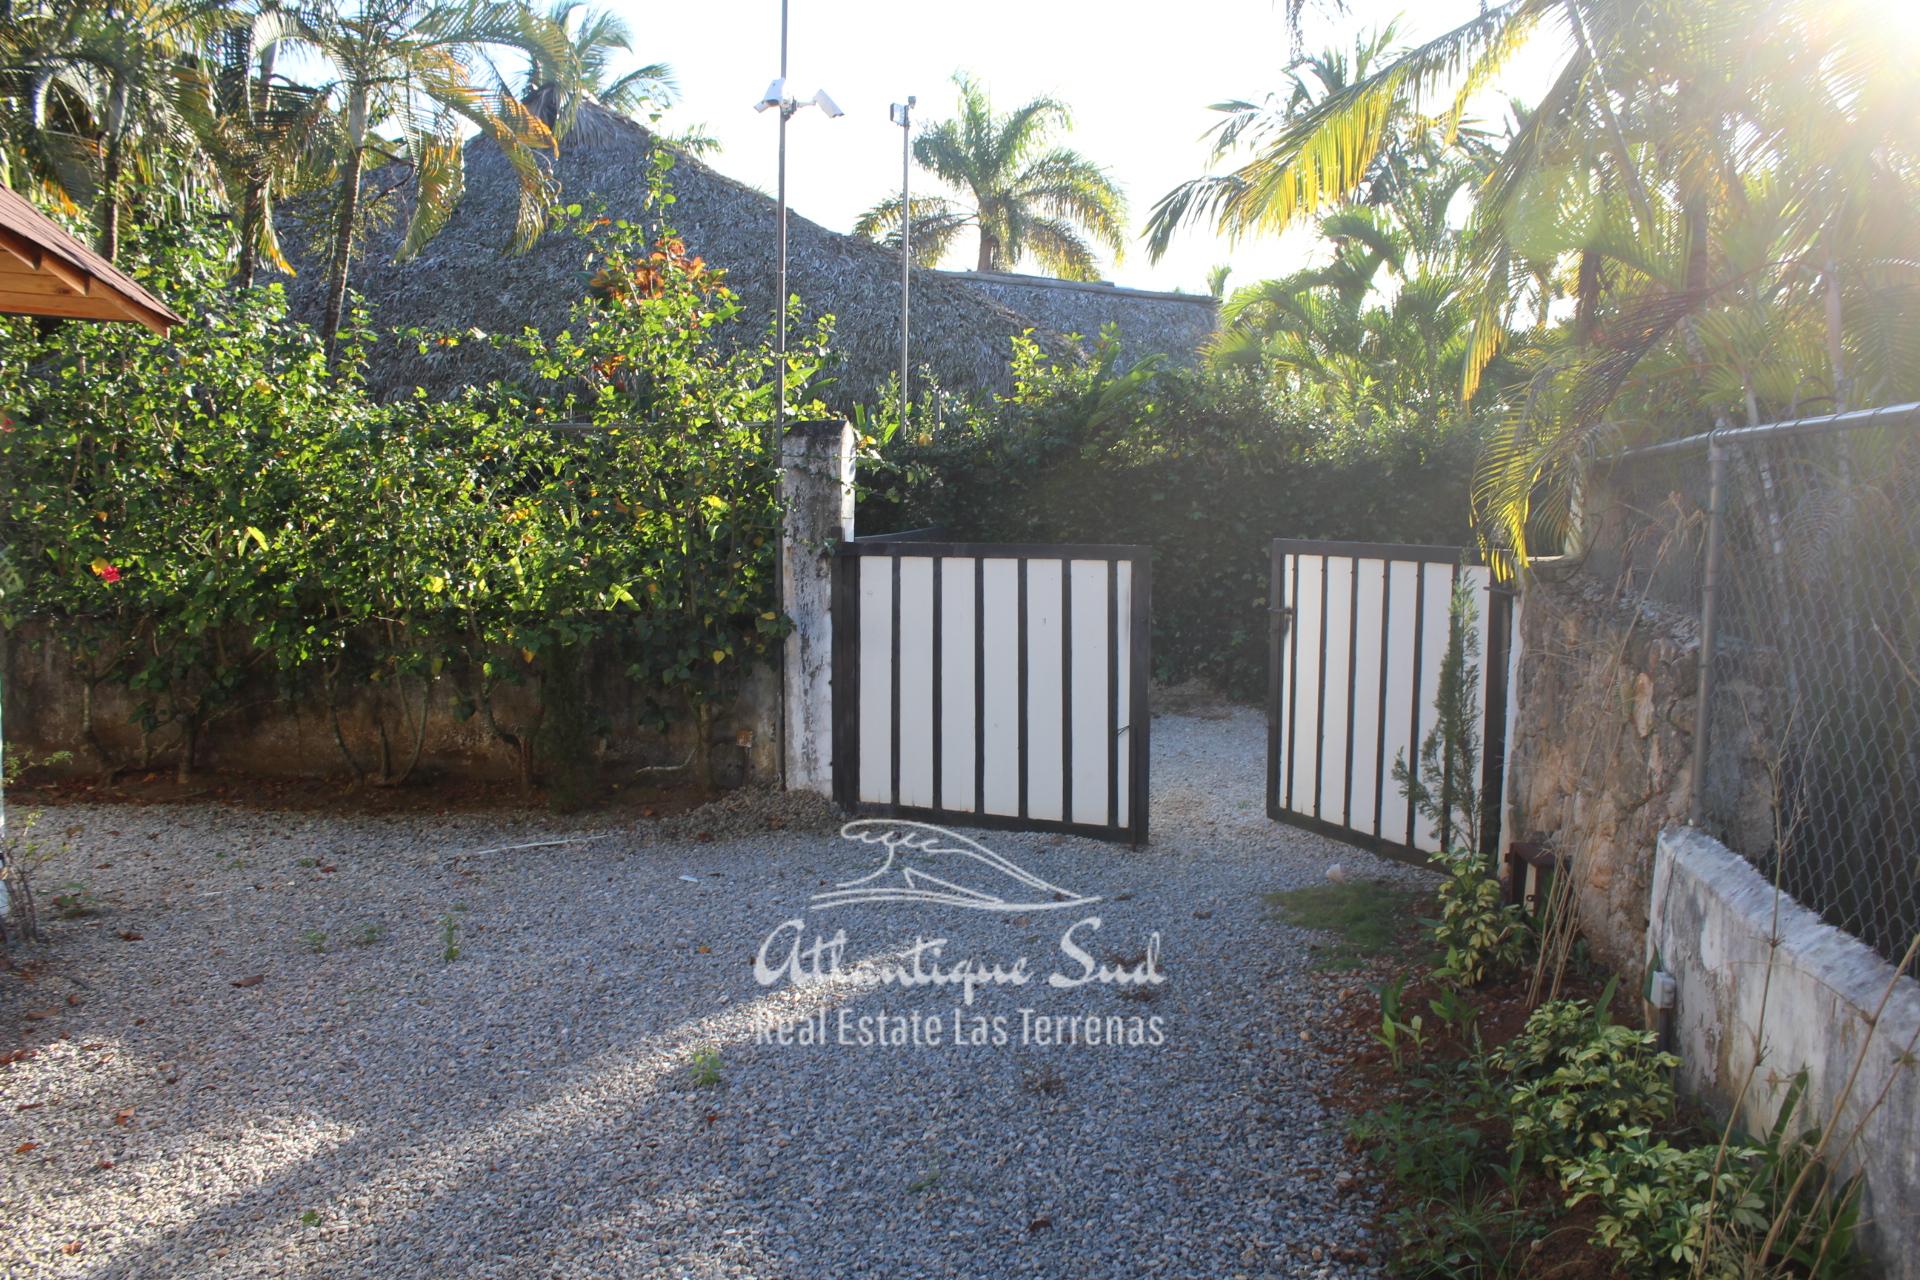 2 carribean villas minutes to the beach Real Estate Las Terrenas Dominican Republic Atlantique Sud23.jpg